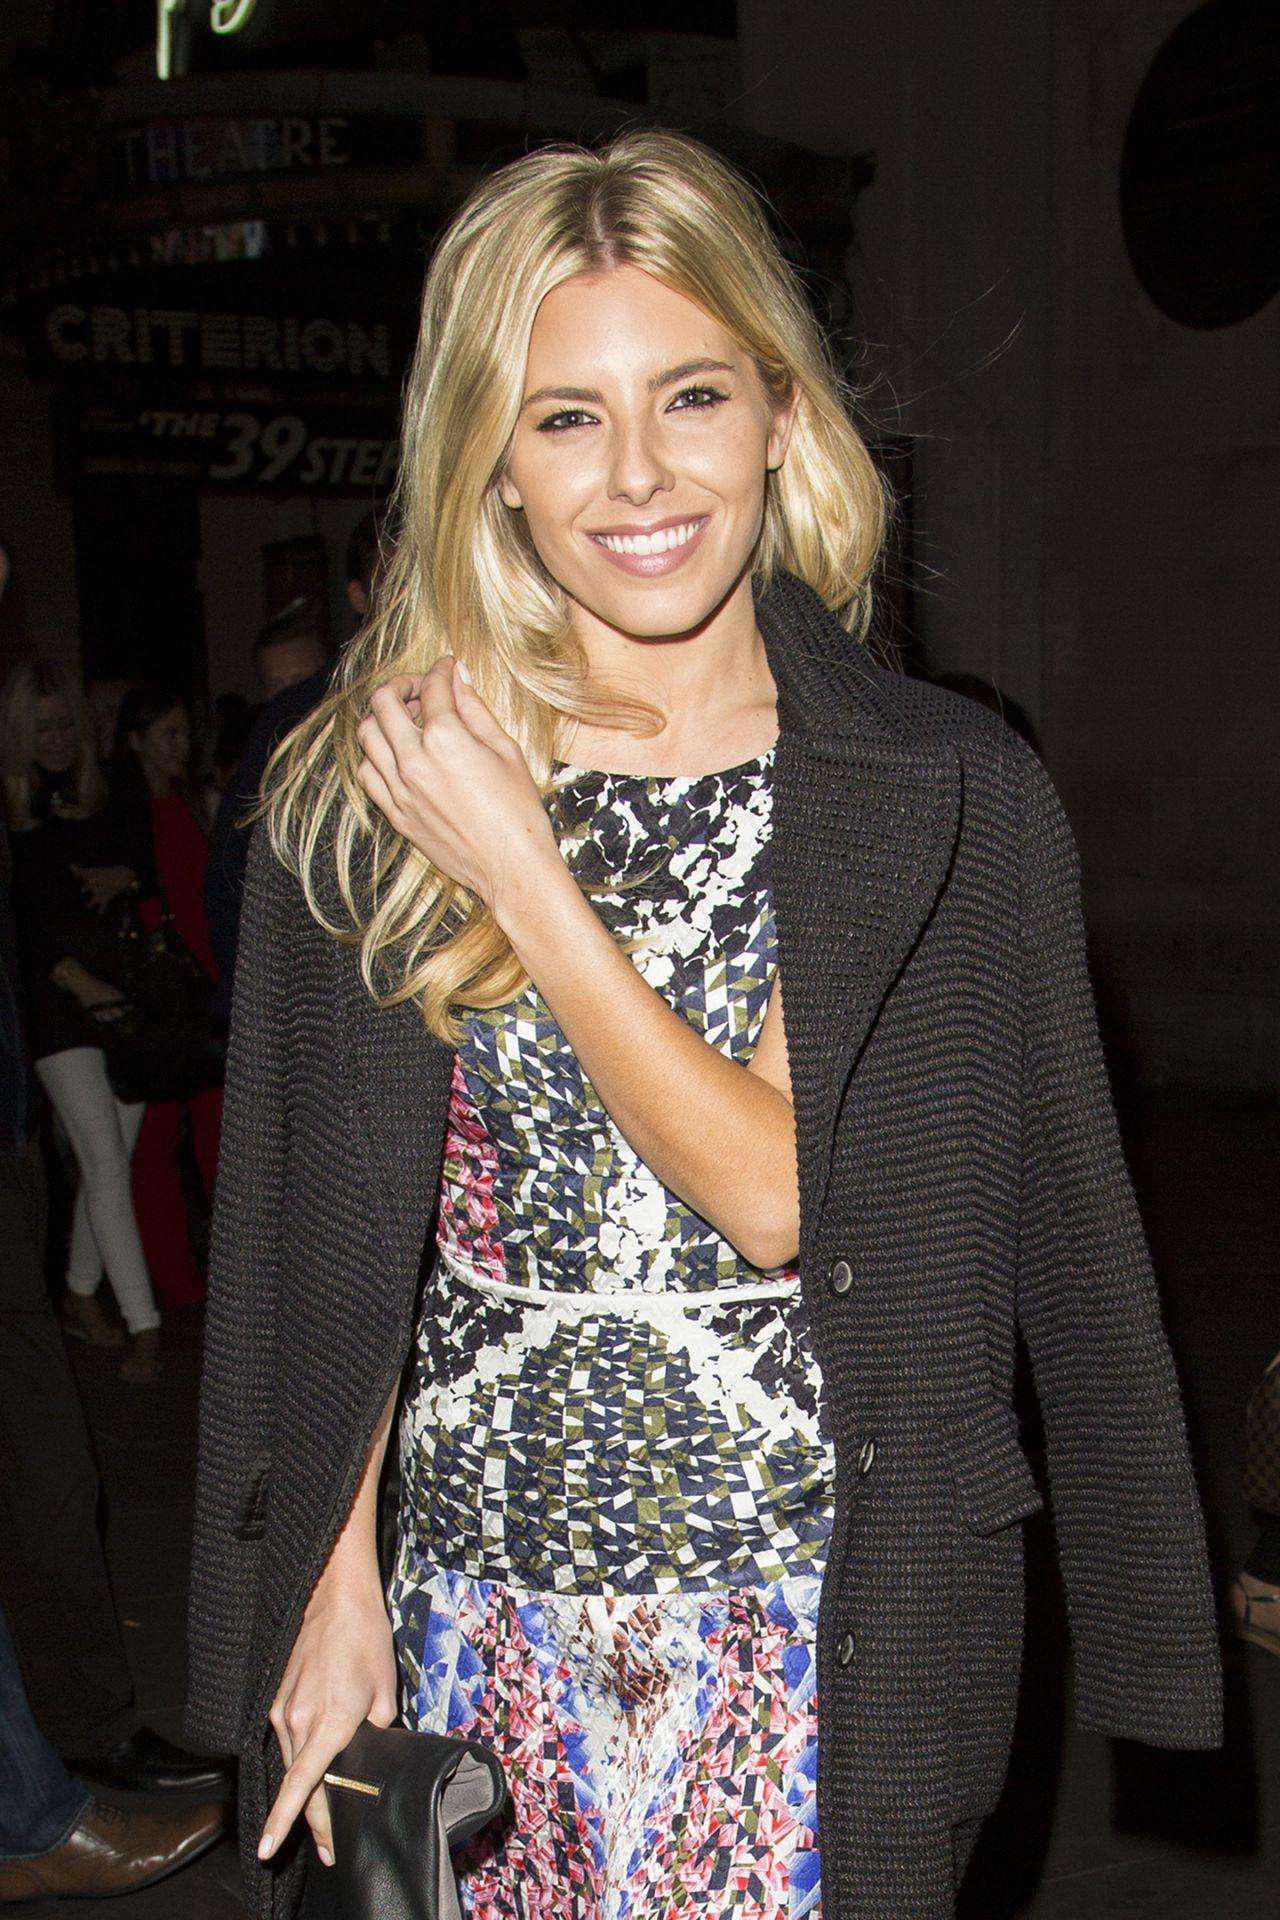 Mollie King - NEXT Model Management London Fashion Week Dinner - September 2014